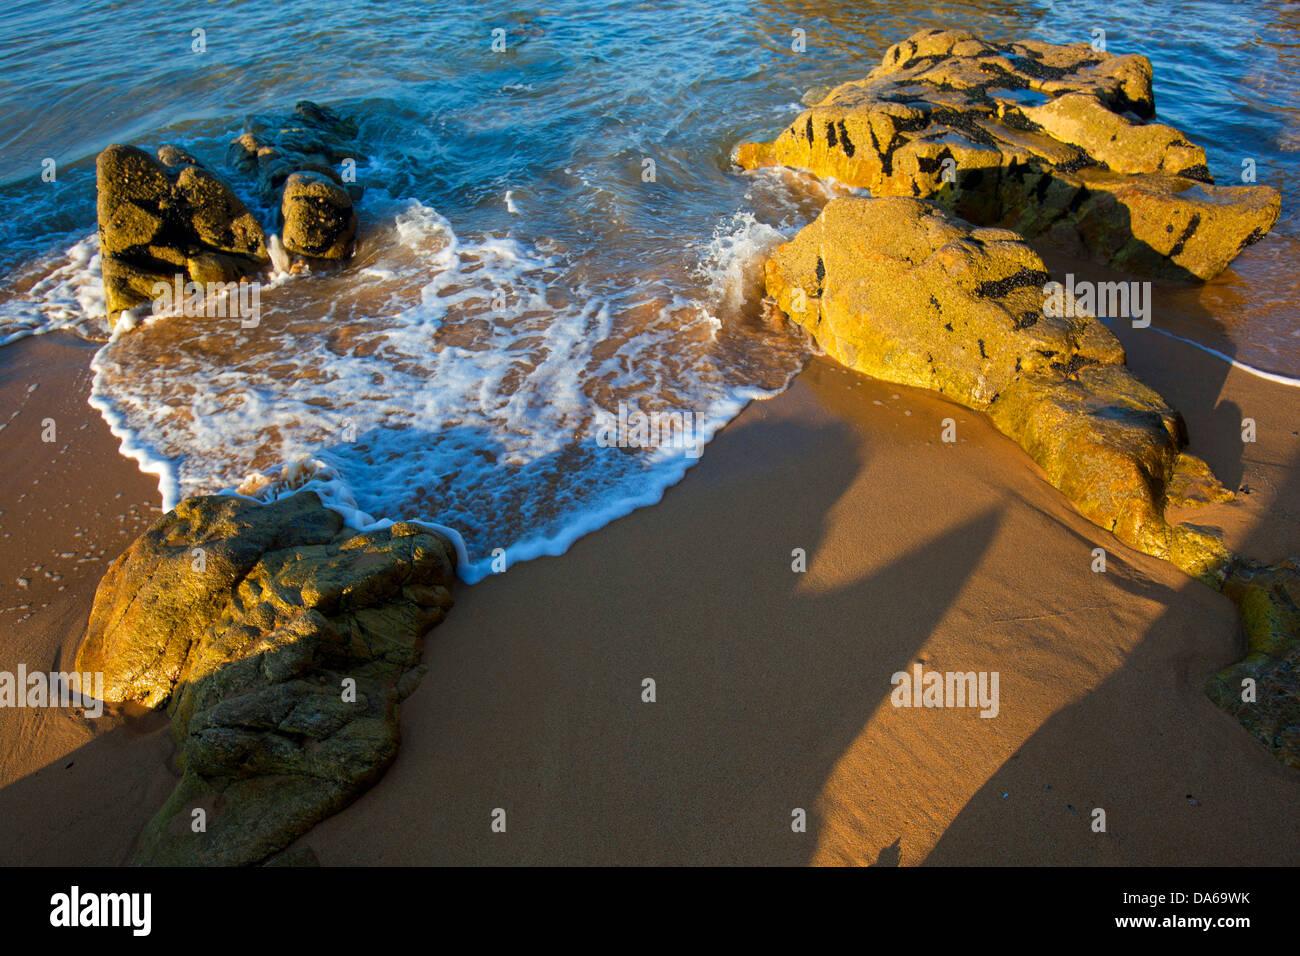 Côte Sauvage, France, Europe, Brittany, department Morbihan, coast, rock, cliff, sea, sand beach - Stock Image